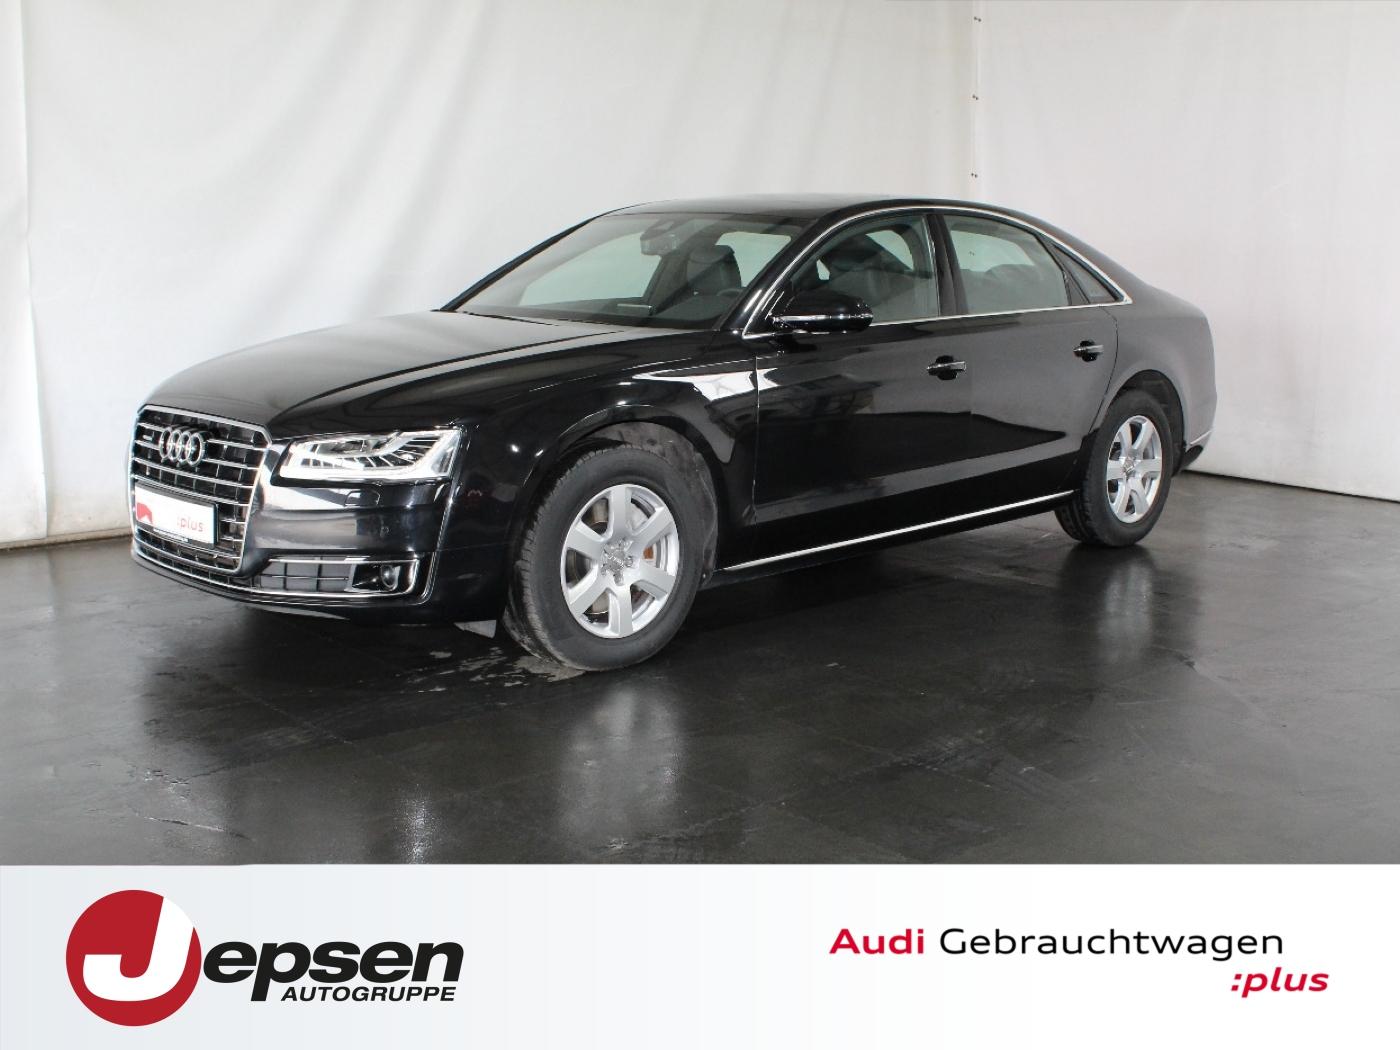 Audi A8 3.0 TDI qu. Tiptr. S-Dach Bose LED Standhzg L, Jahr 2014, Diesel